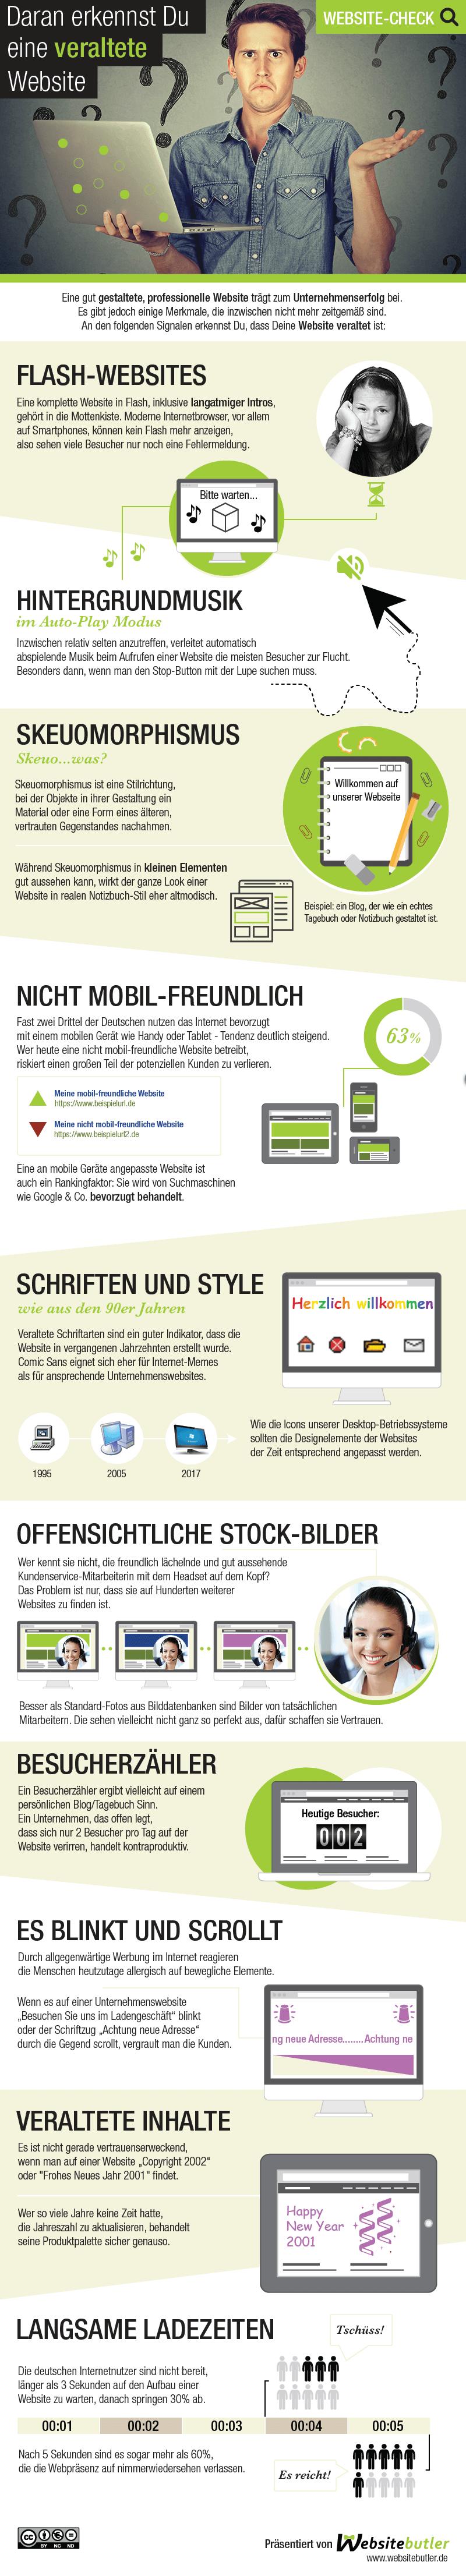 Infografik zur Website Gestaltung